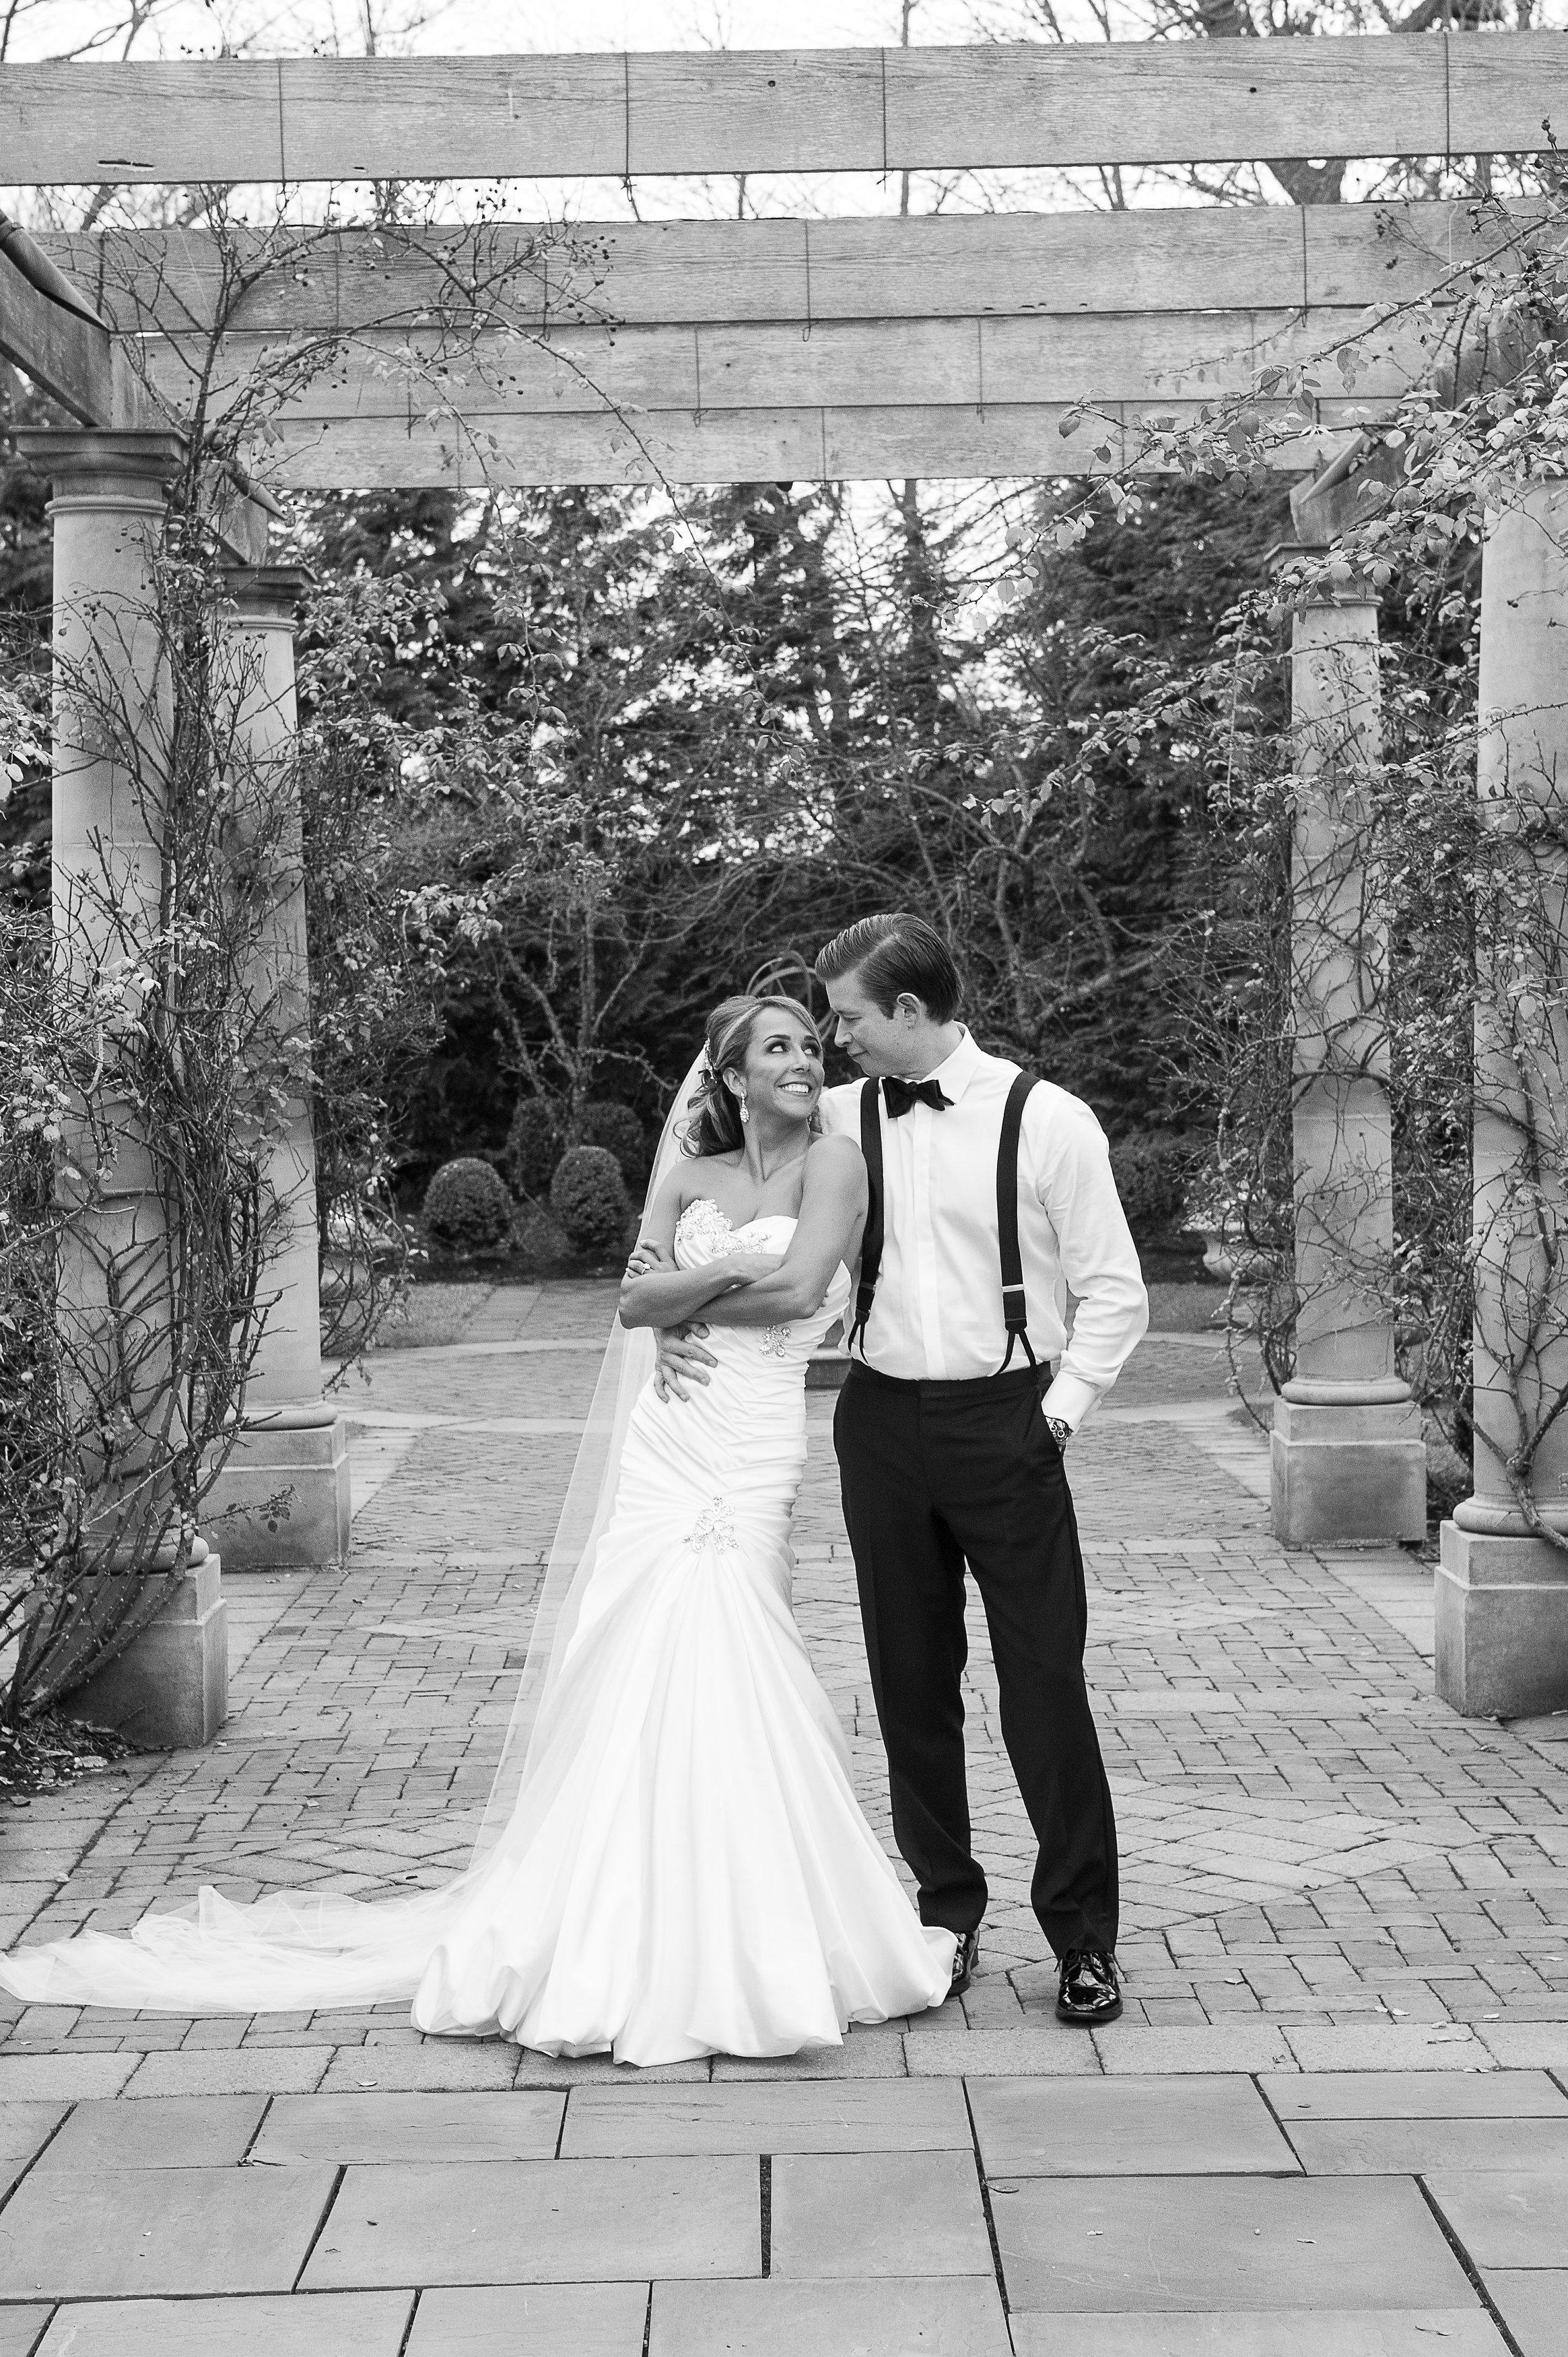 Ceci_New_York_Custom_Invitation_ New_Jersey_Wedding_Luxury_Personalized_Ceci_Style_Bride_Foil_Stamping101.JPG